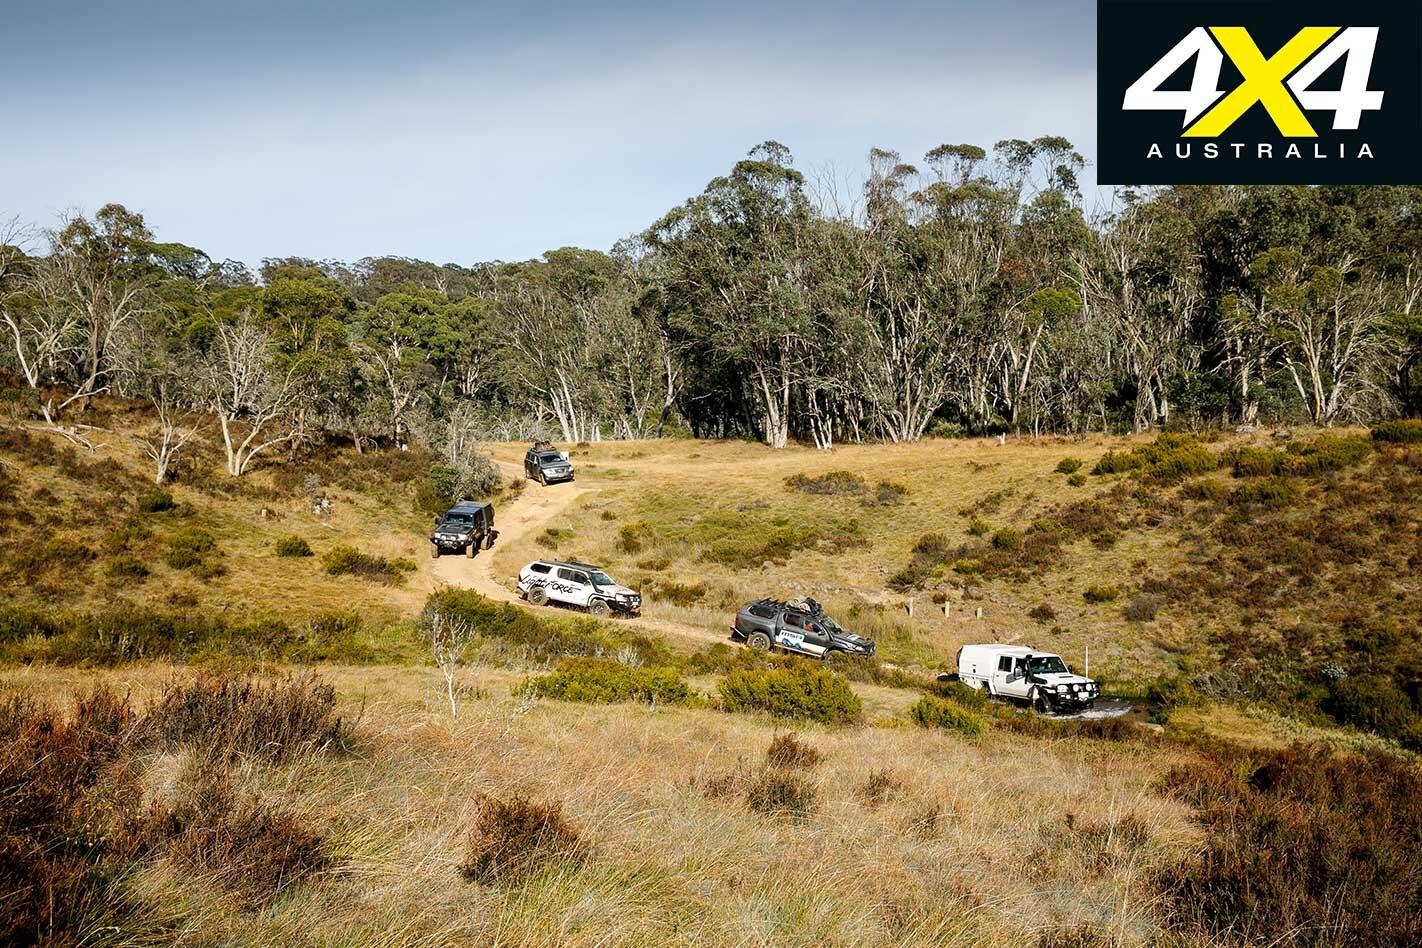 Victorian High Country 4 X 4 Tracks Jpg